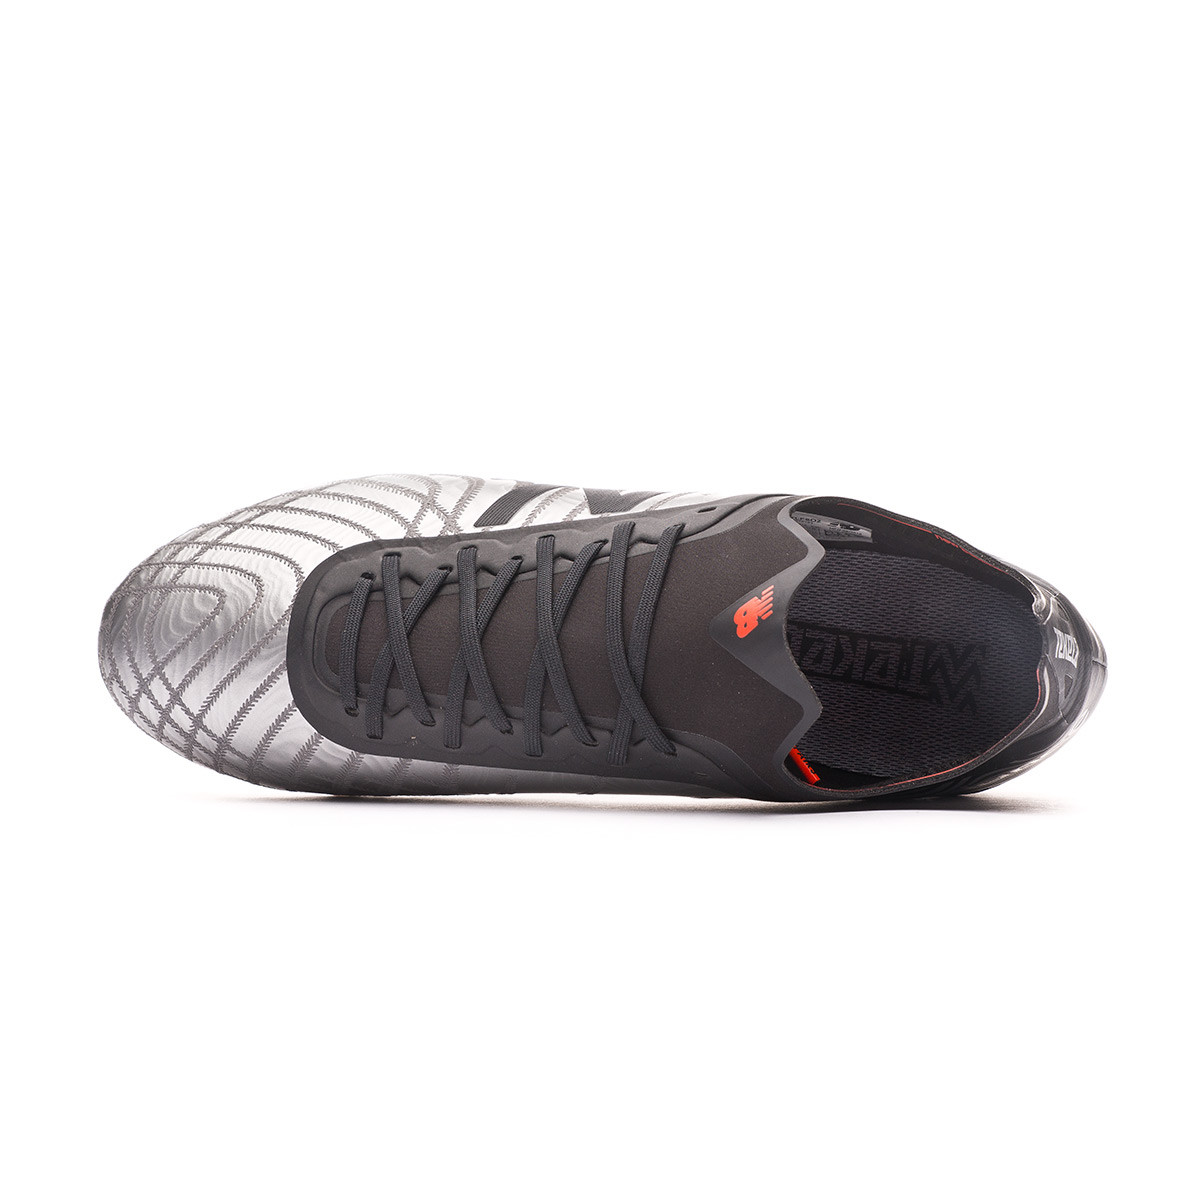 Zapatos de fútbol New Balance Tekela 2 Pro Pitch Control